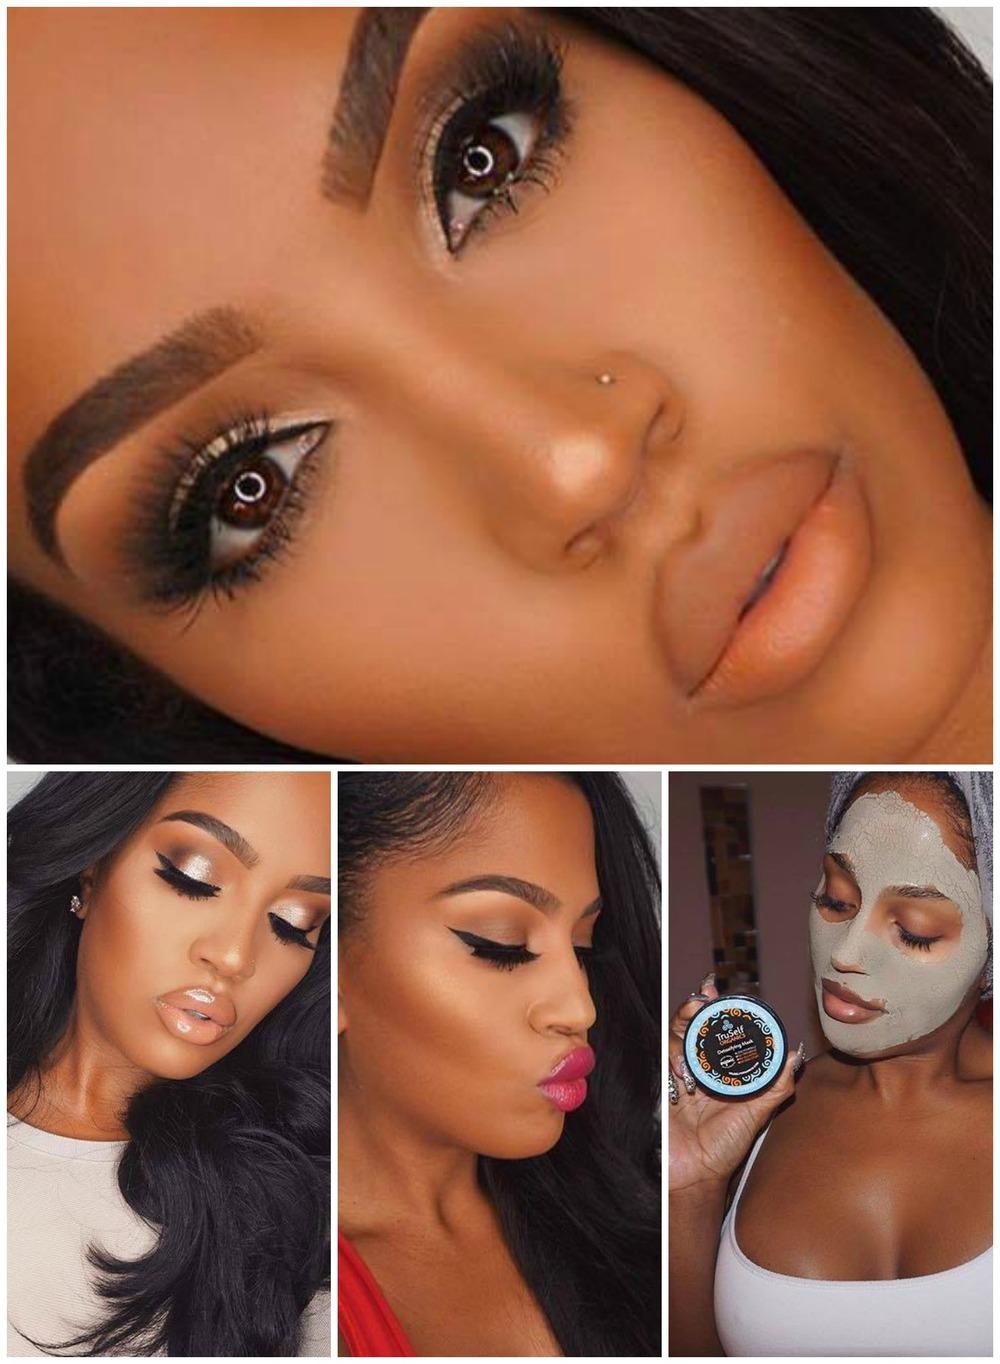 Instagram Name: MakeupShayla